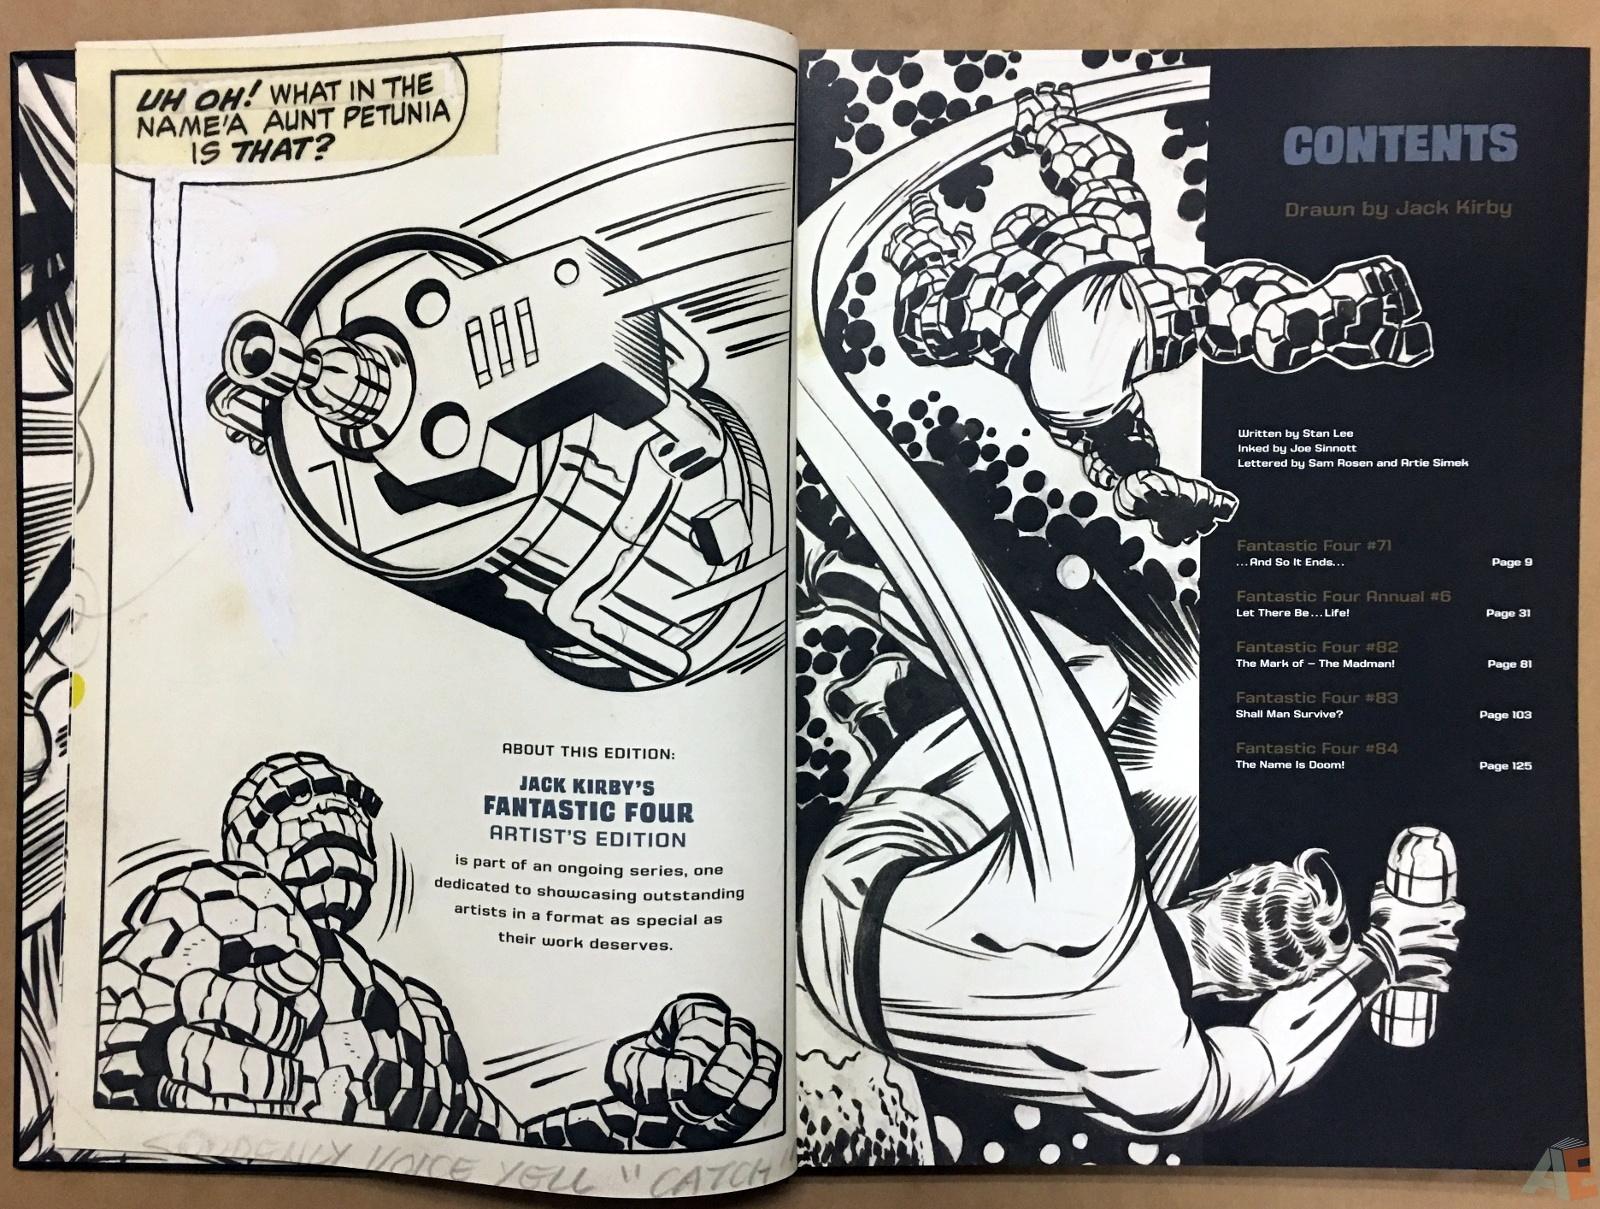 Jack Kirby's Fantastic Four Artist's Edition 8